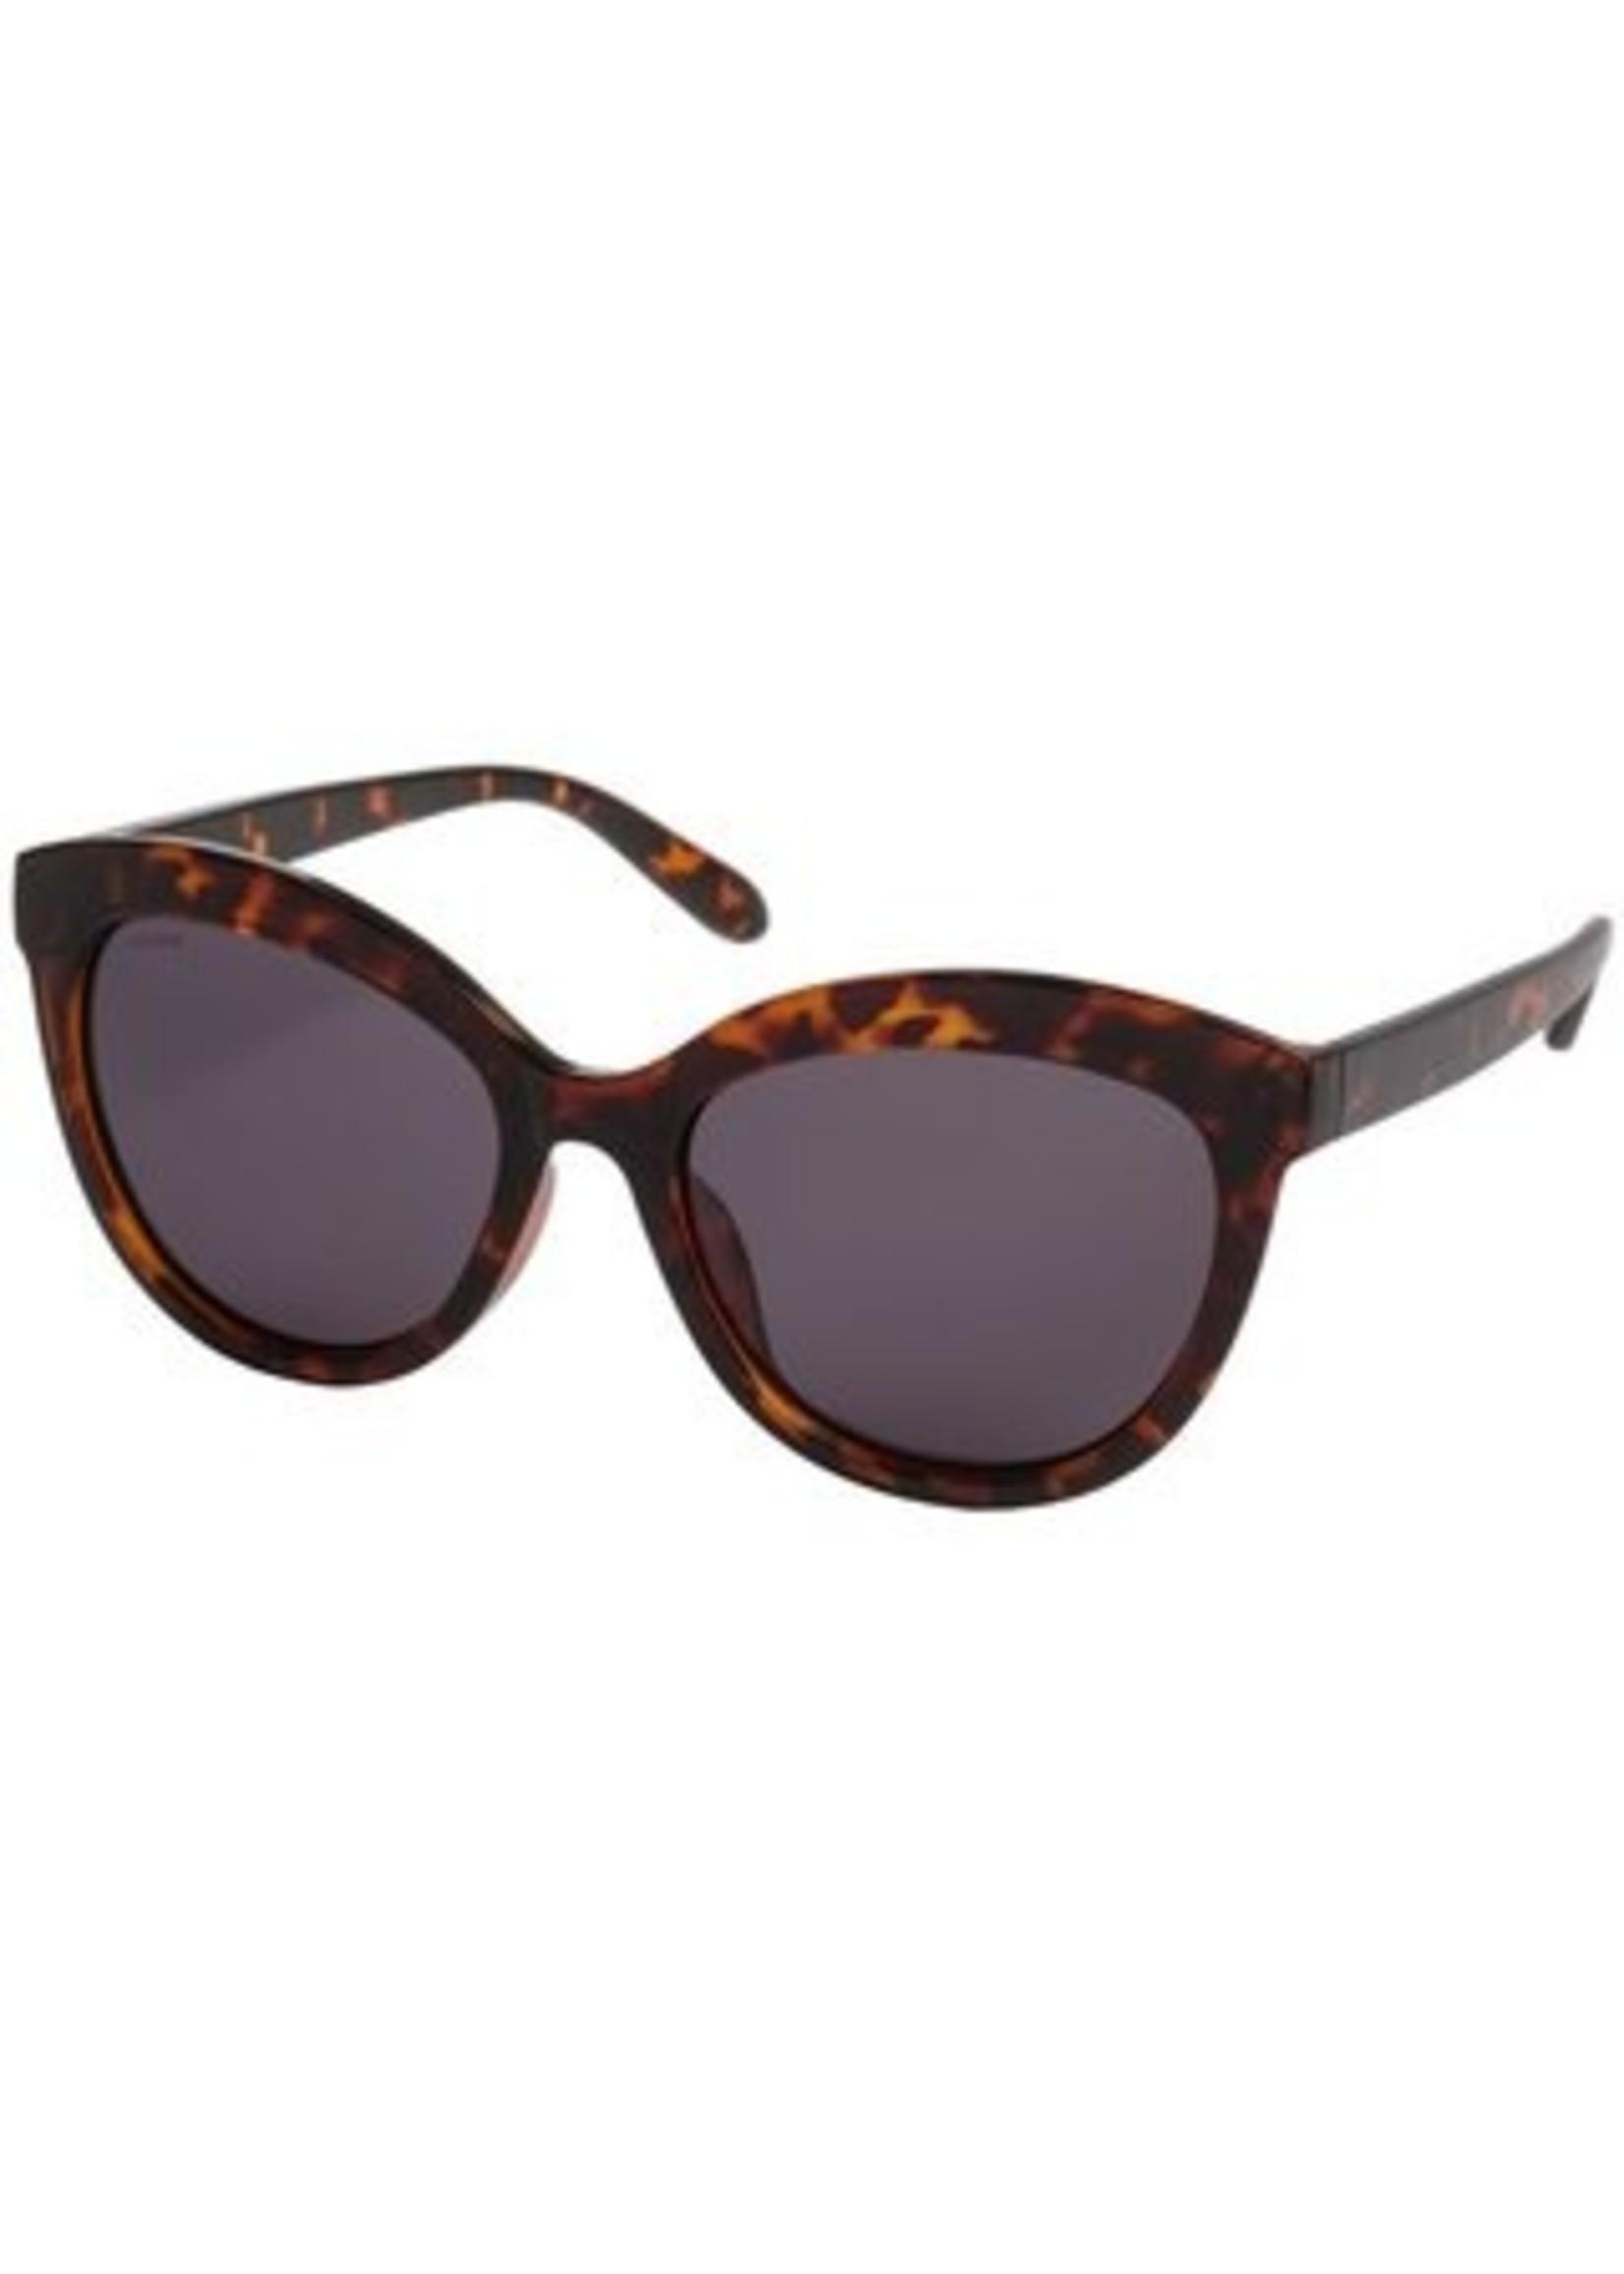 Tulia Sunglasses - Brown